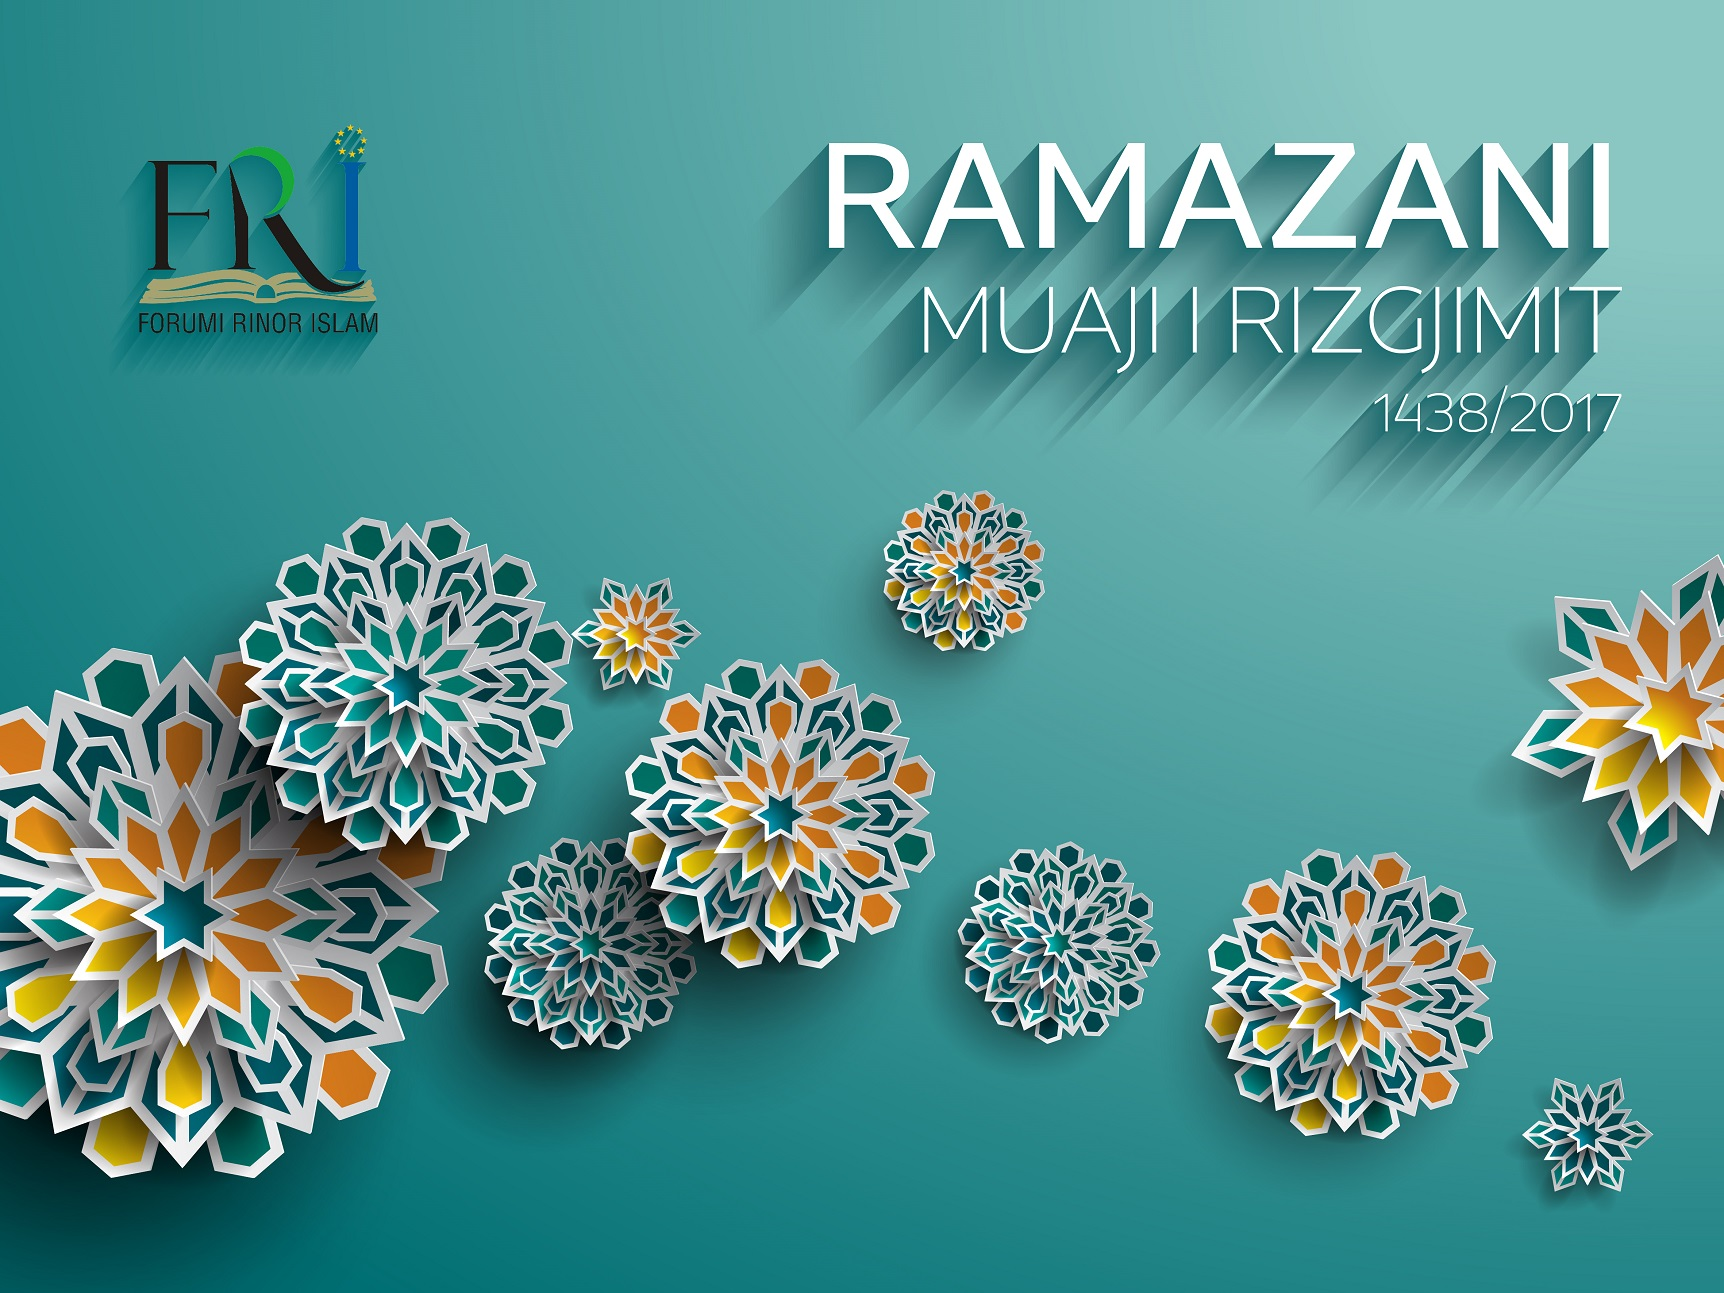 Dizajni Muaji Ramazan 2017 7-01 - Copy